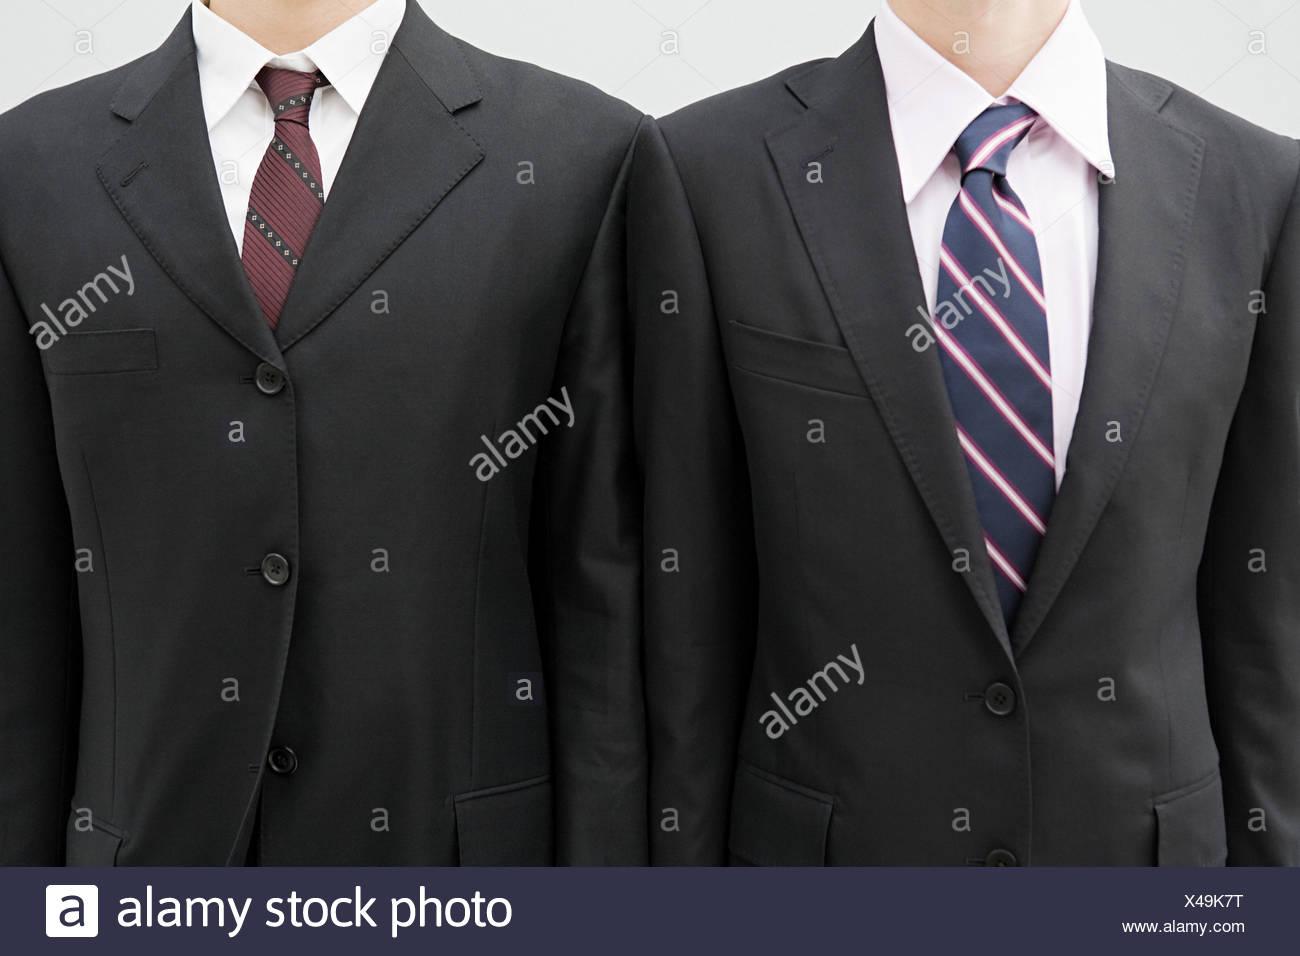 Businessmen wearing suit jackets - Stock Image